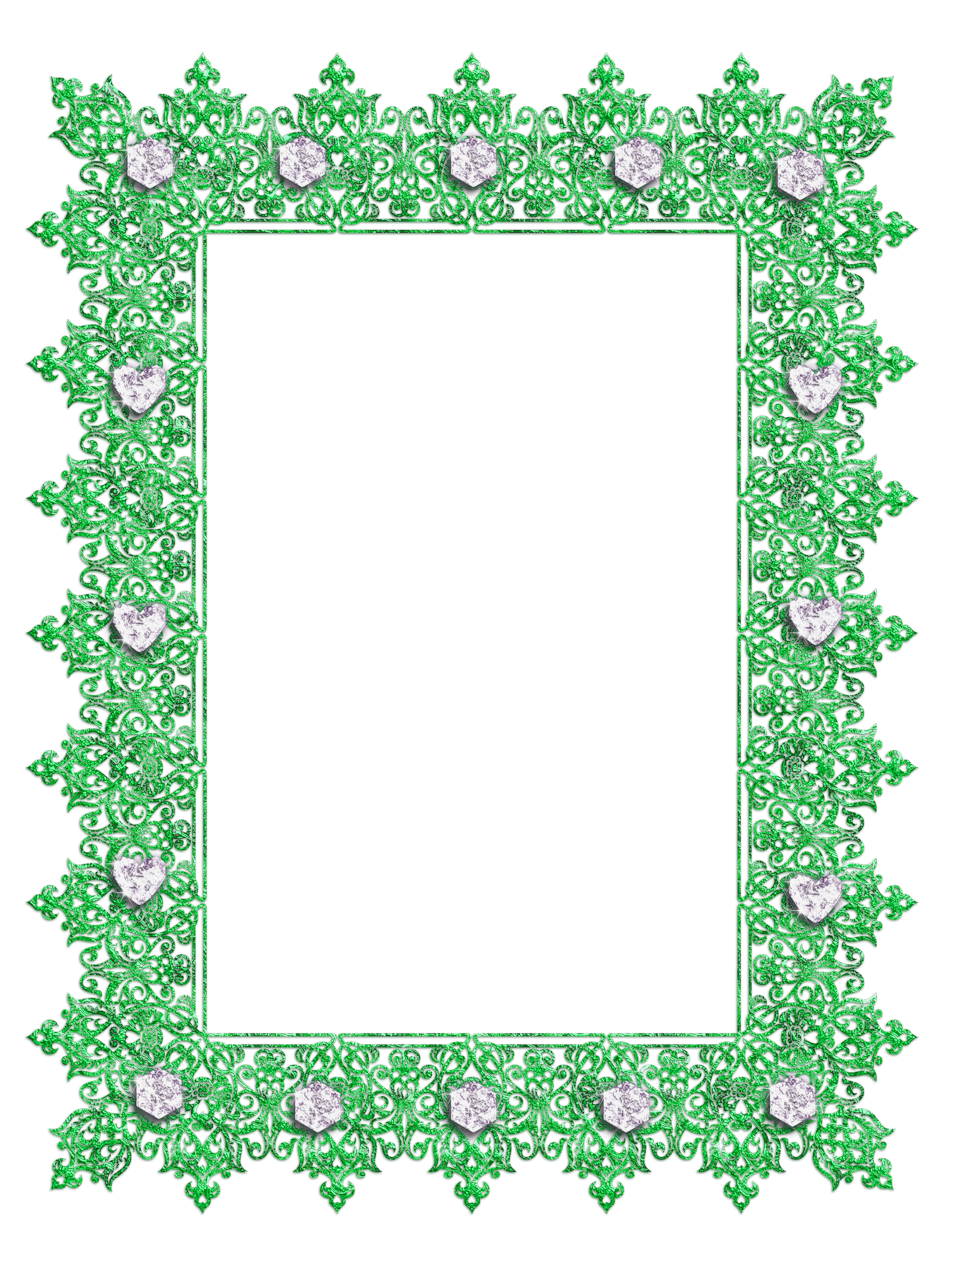 Green Transparent Frame with Diamonds Bingkai, Alas